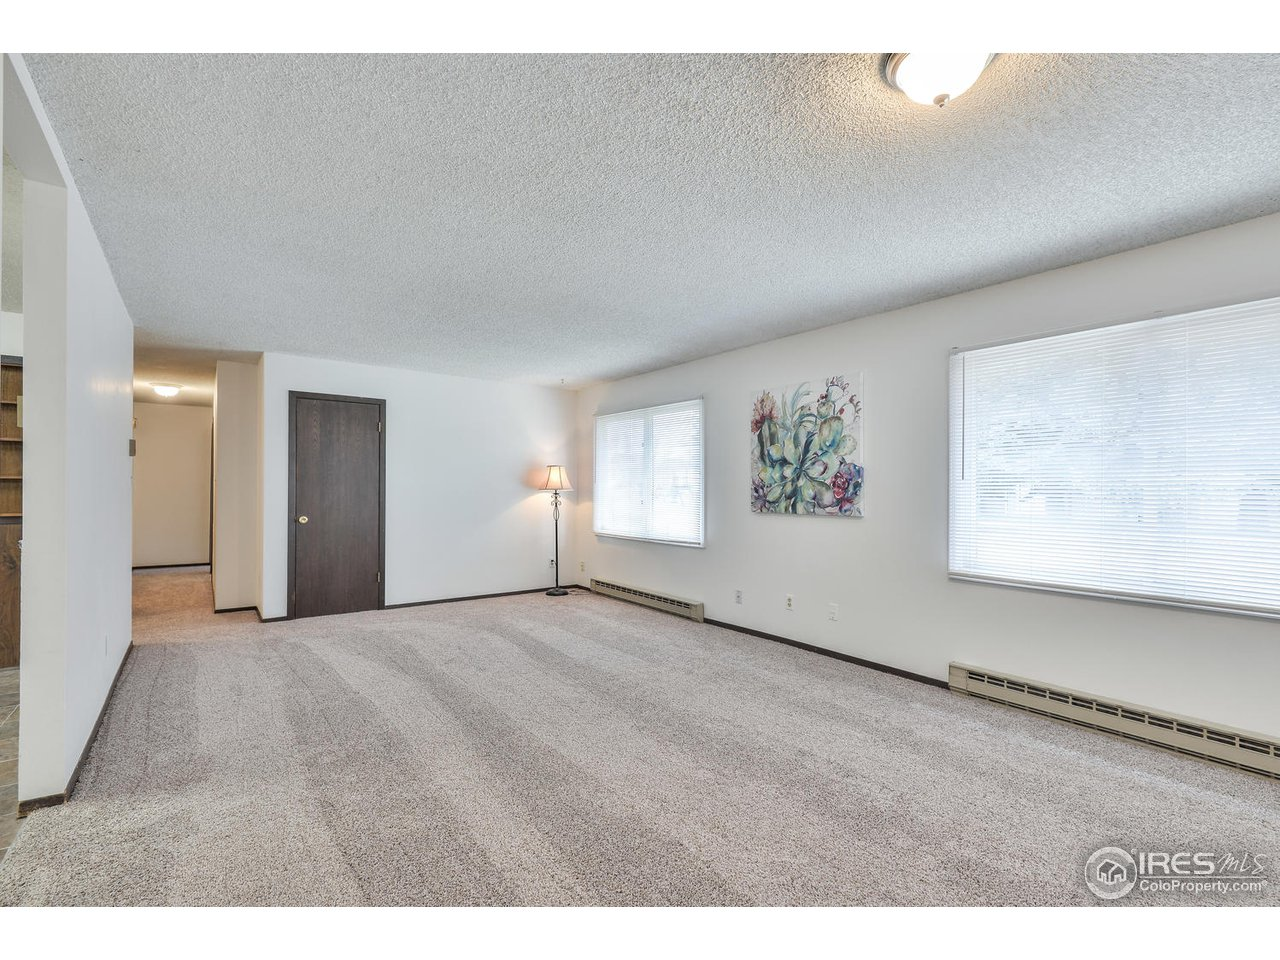 Great room facing bedroom hallway